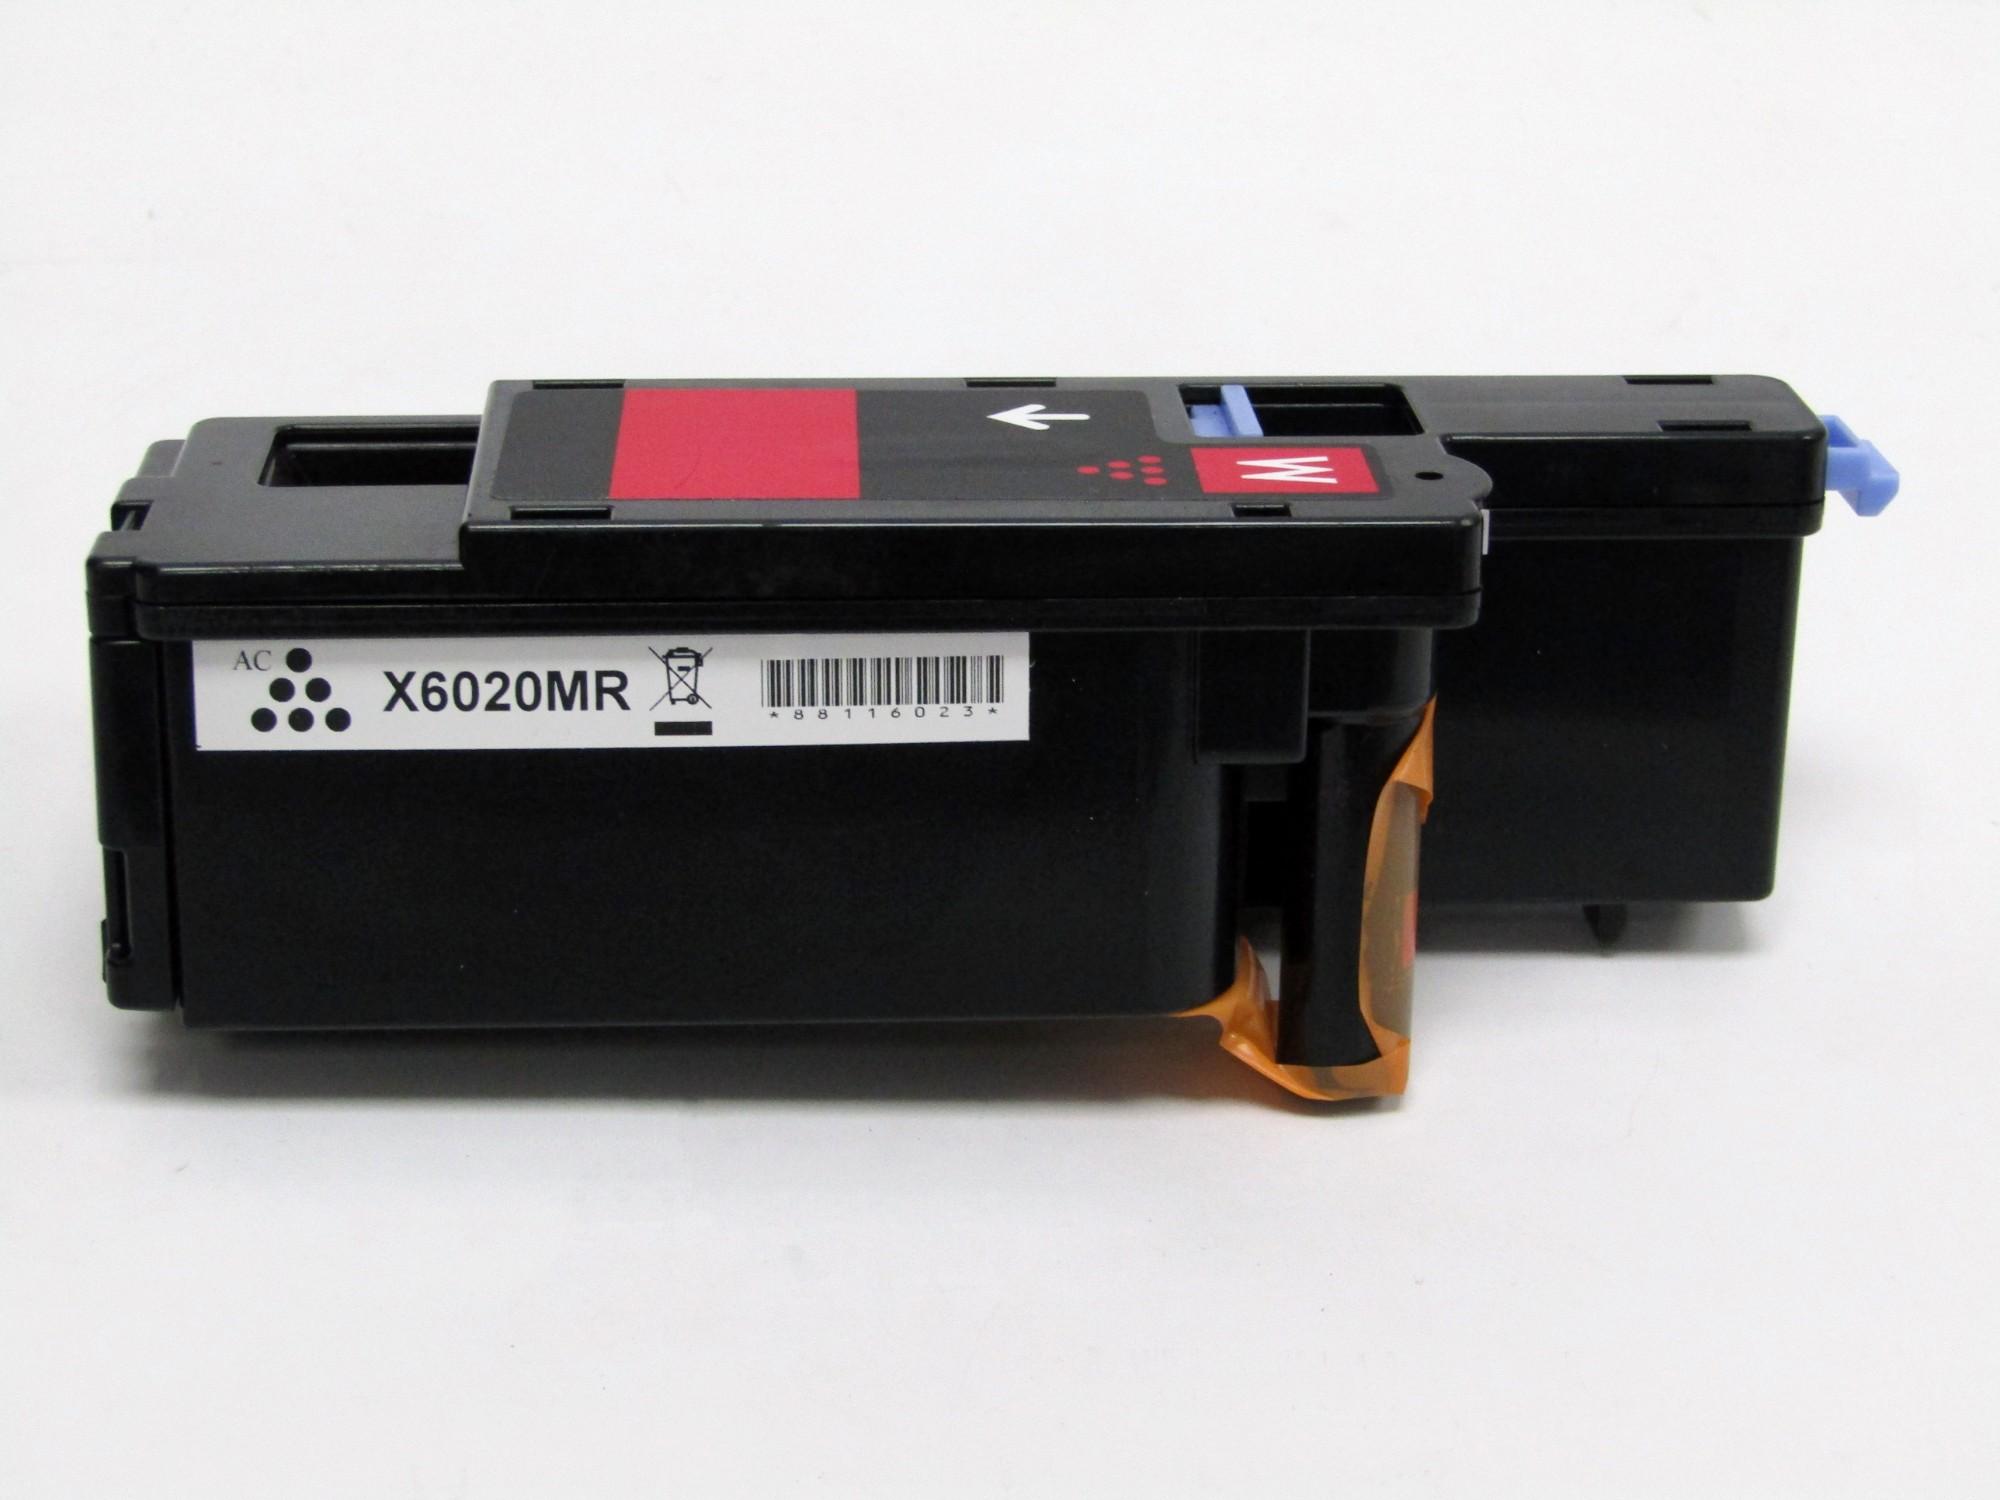 Remanufactured Xerox 106R02757 Magenta Toner Cartridge